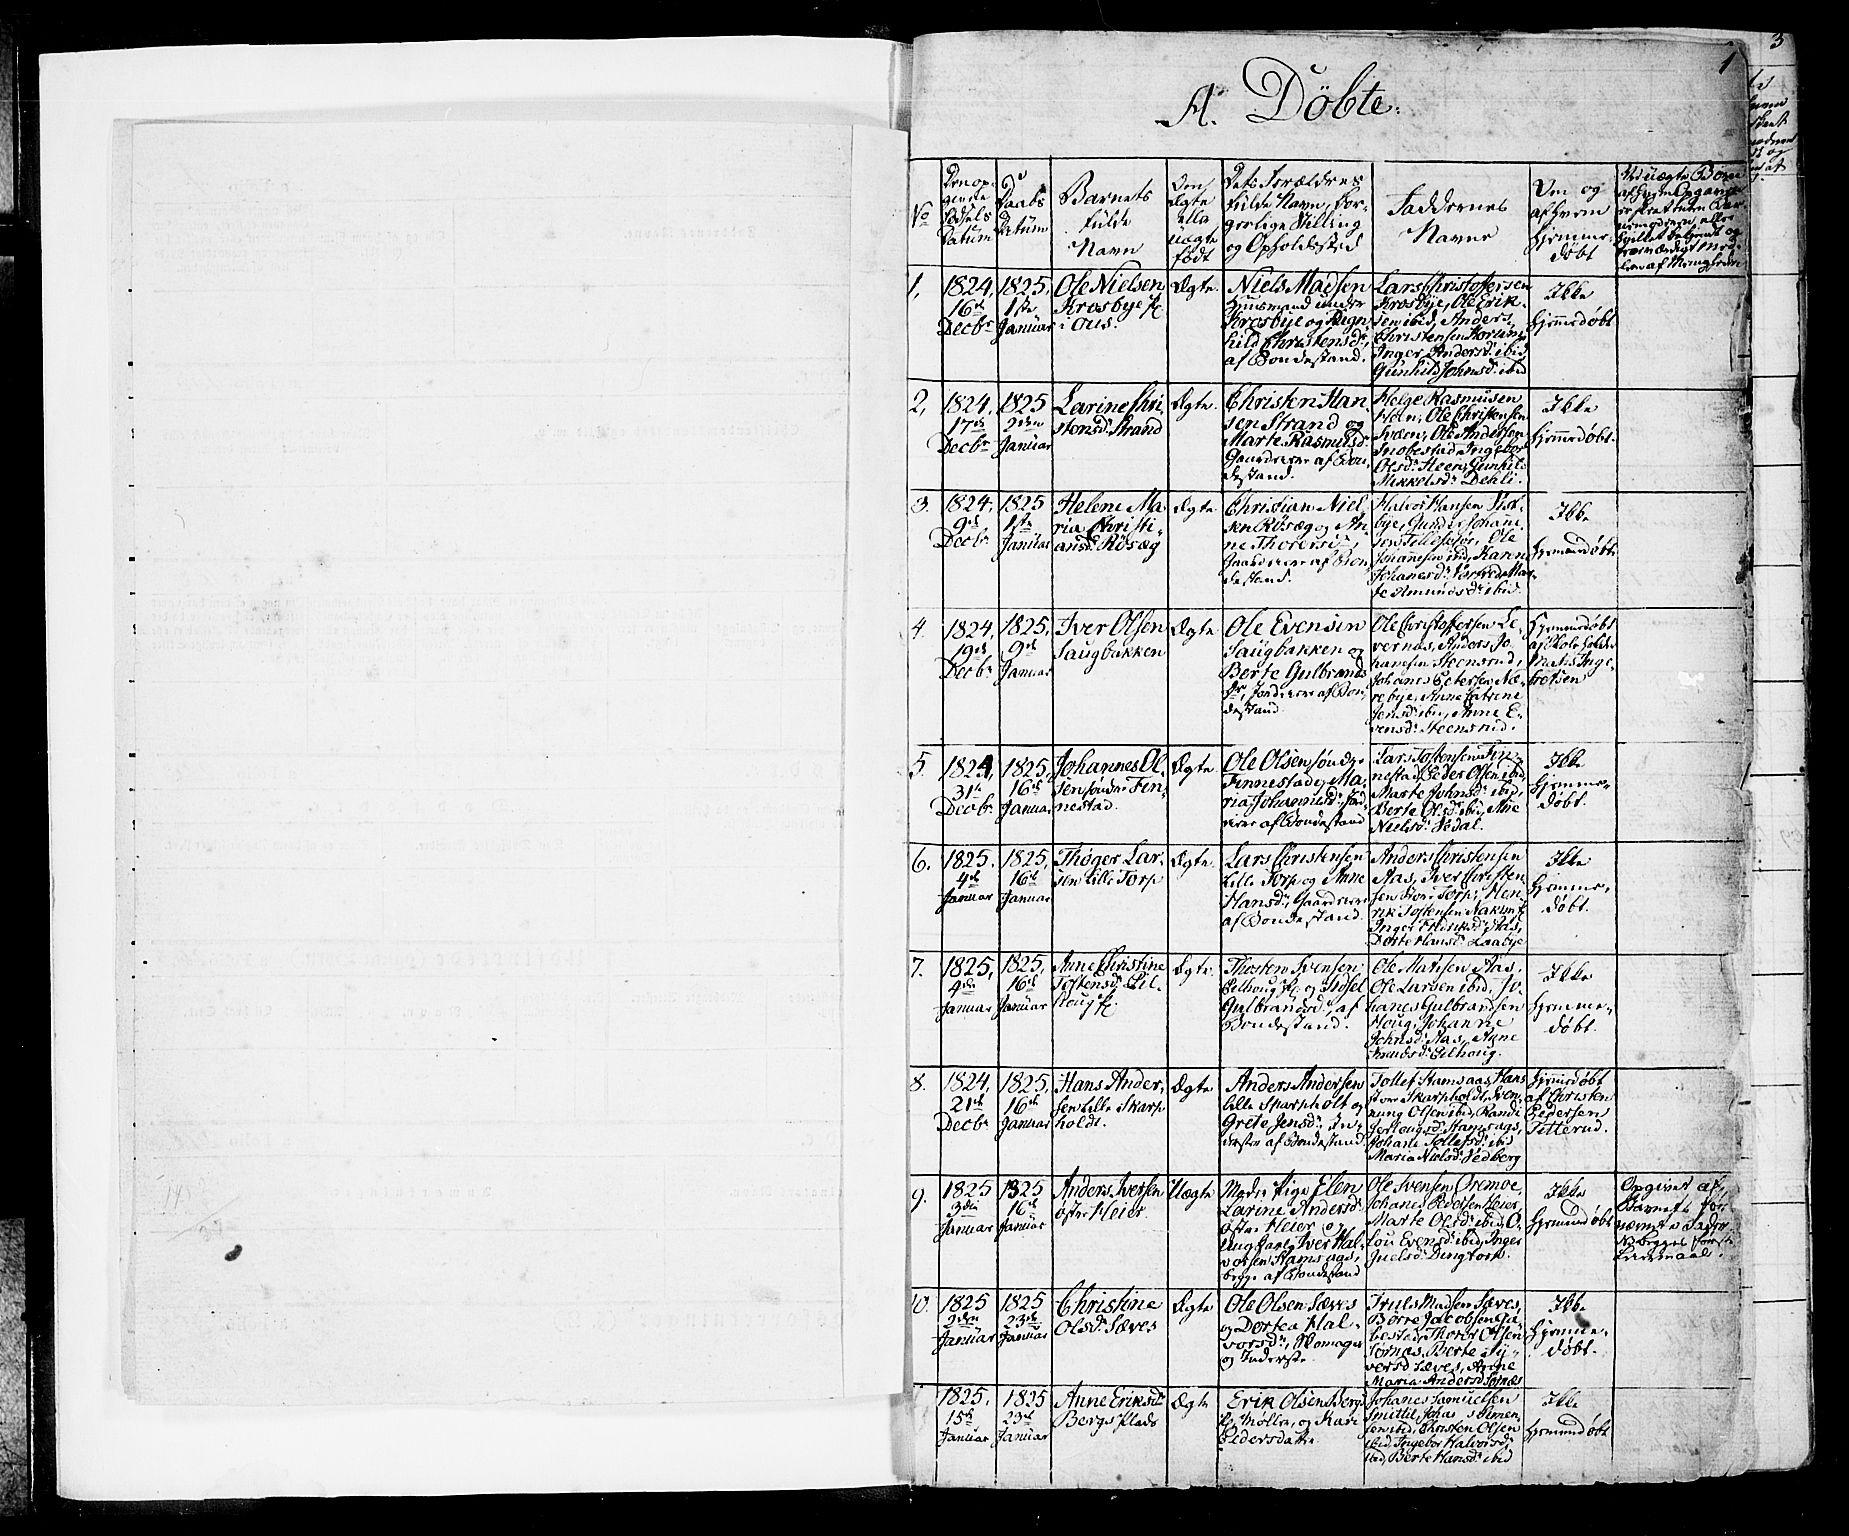 SAO, Rakkestad prestekontor Kirkebøker, F/Fa/L0007: Ministerialbok nr. I 7, 1825-1841, s. 1